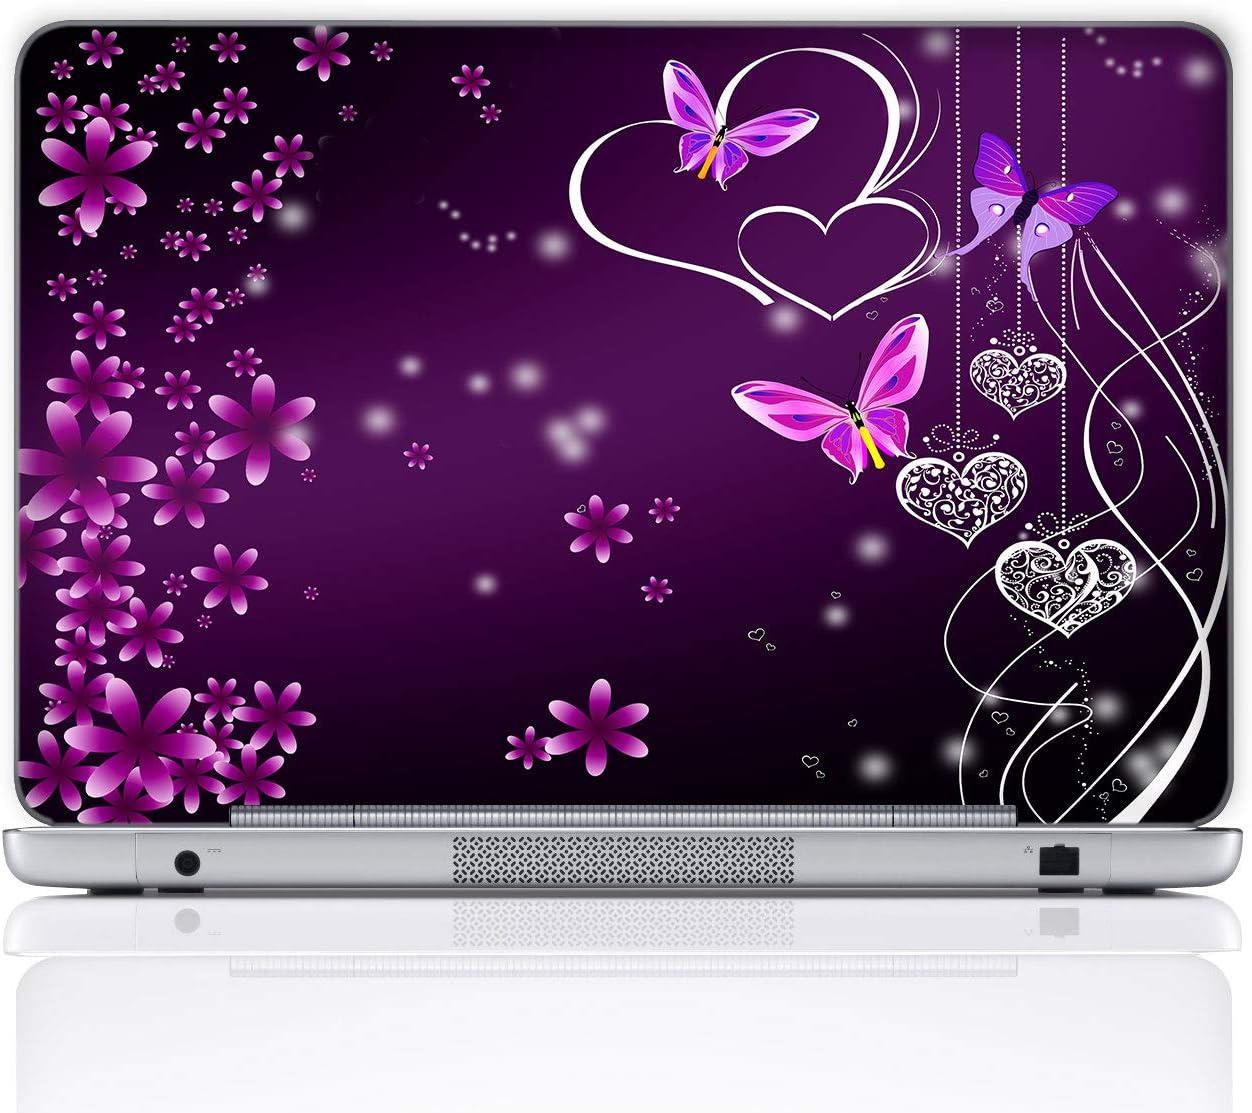 Meffort Inc 15 15.6 Inch Laptop Notebook Skin Sticker Cover Art Decal (Included 2 Wrist pad) - Purple Butterfly Heart